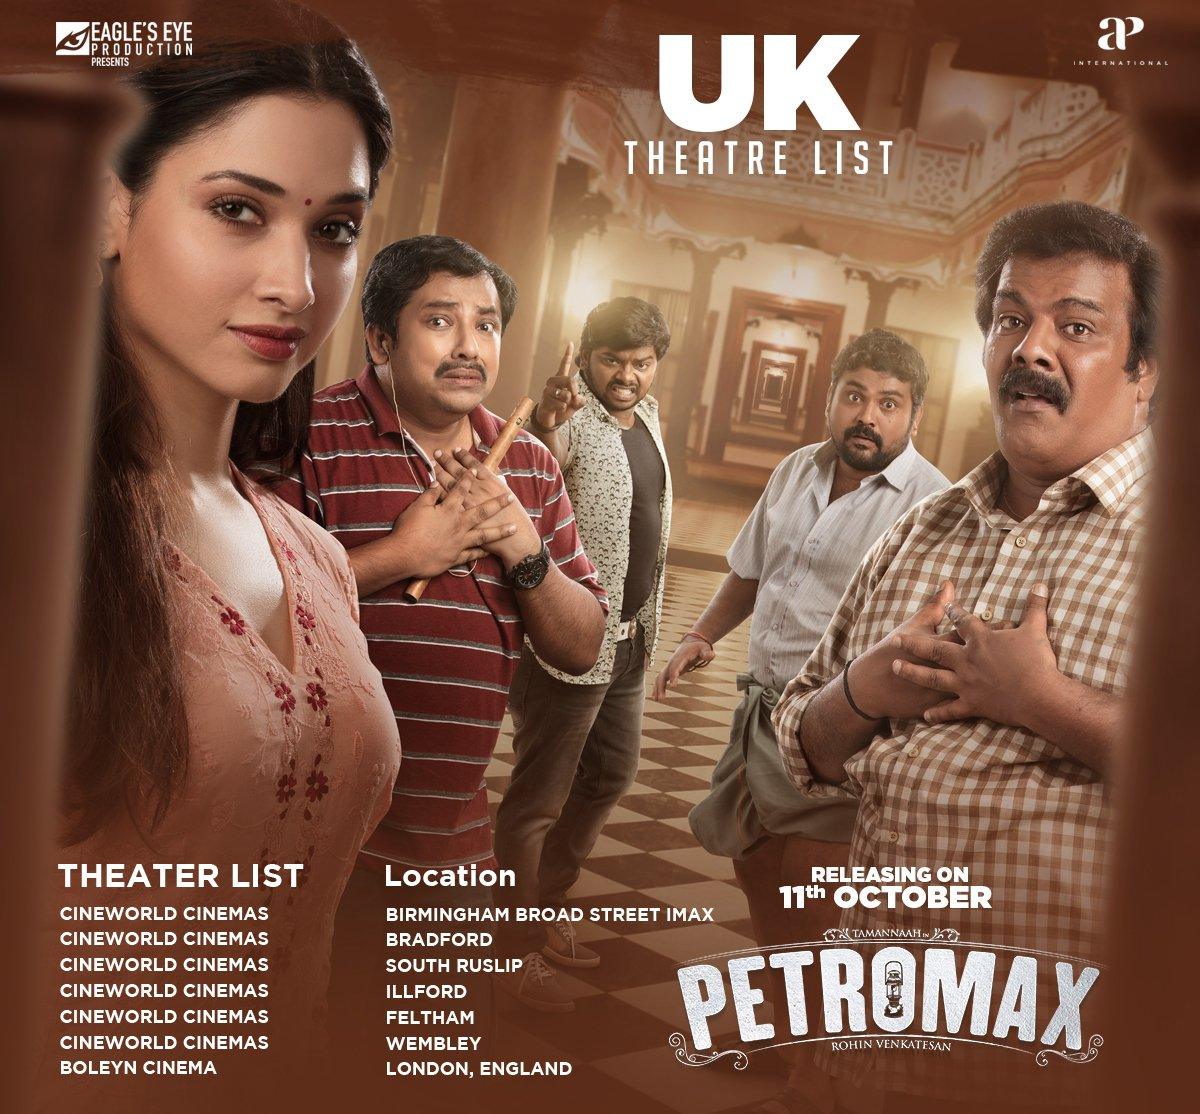 Petromax UK Theatre List